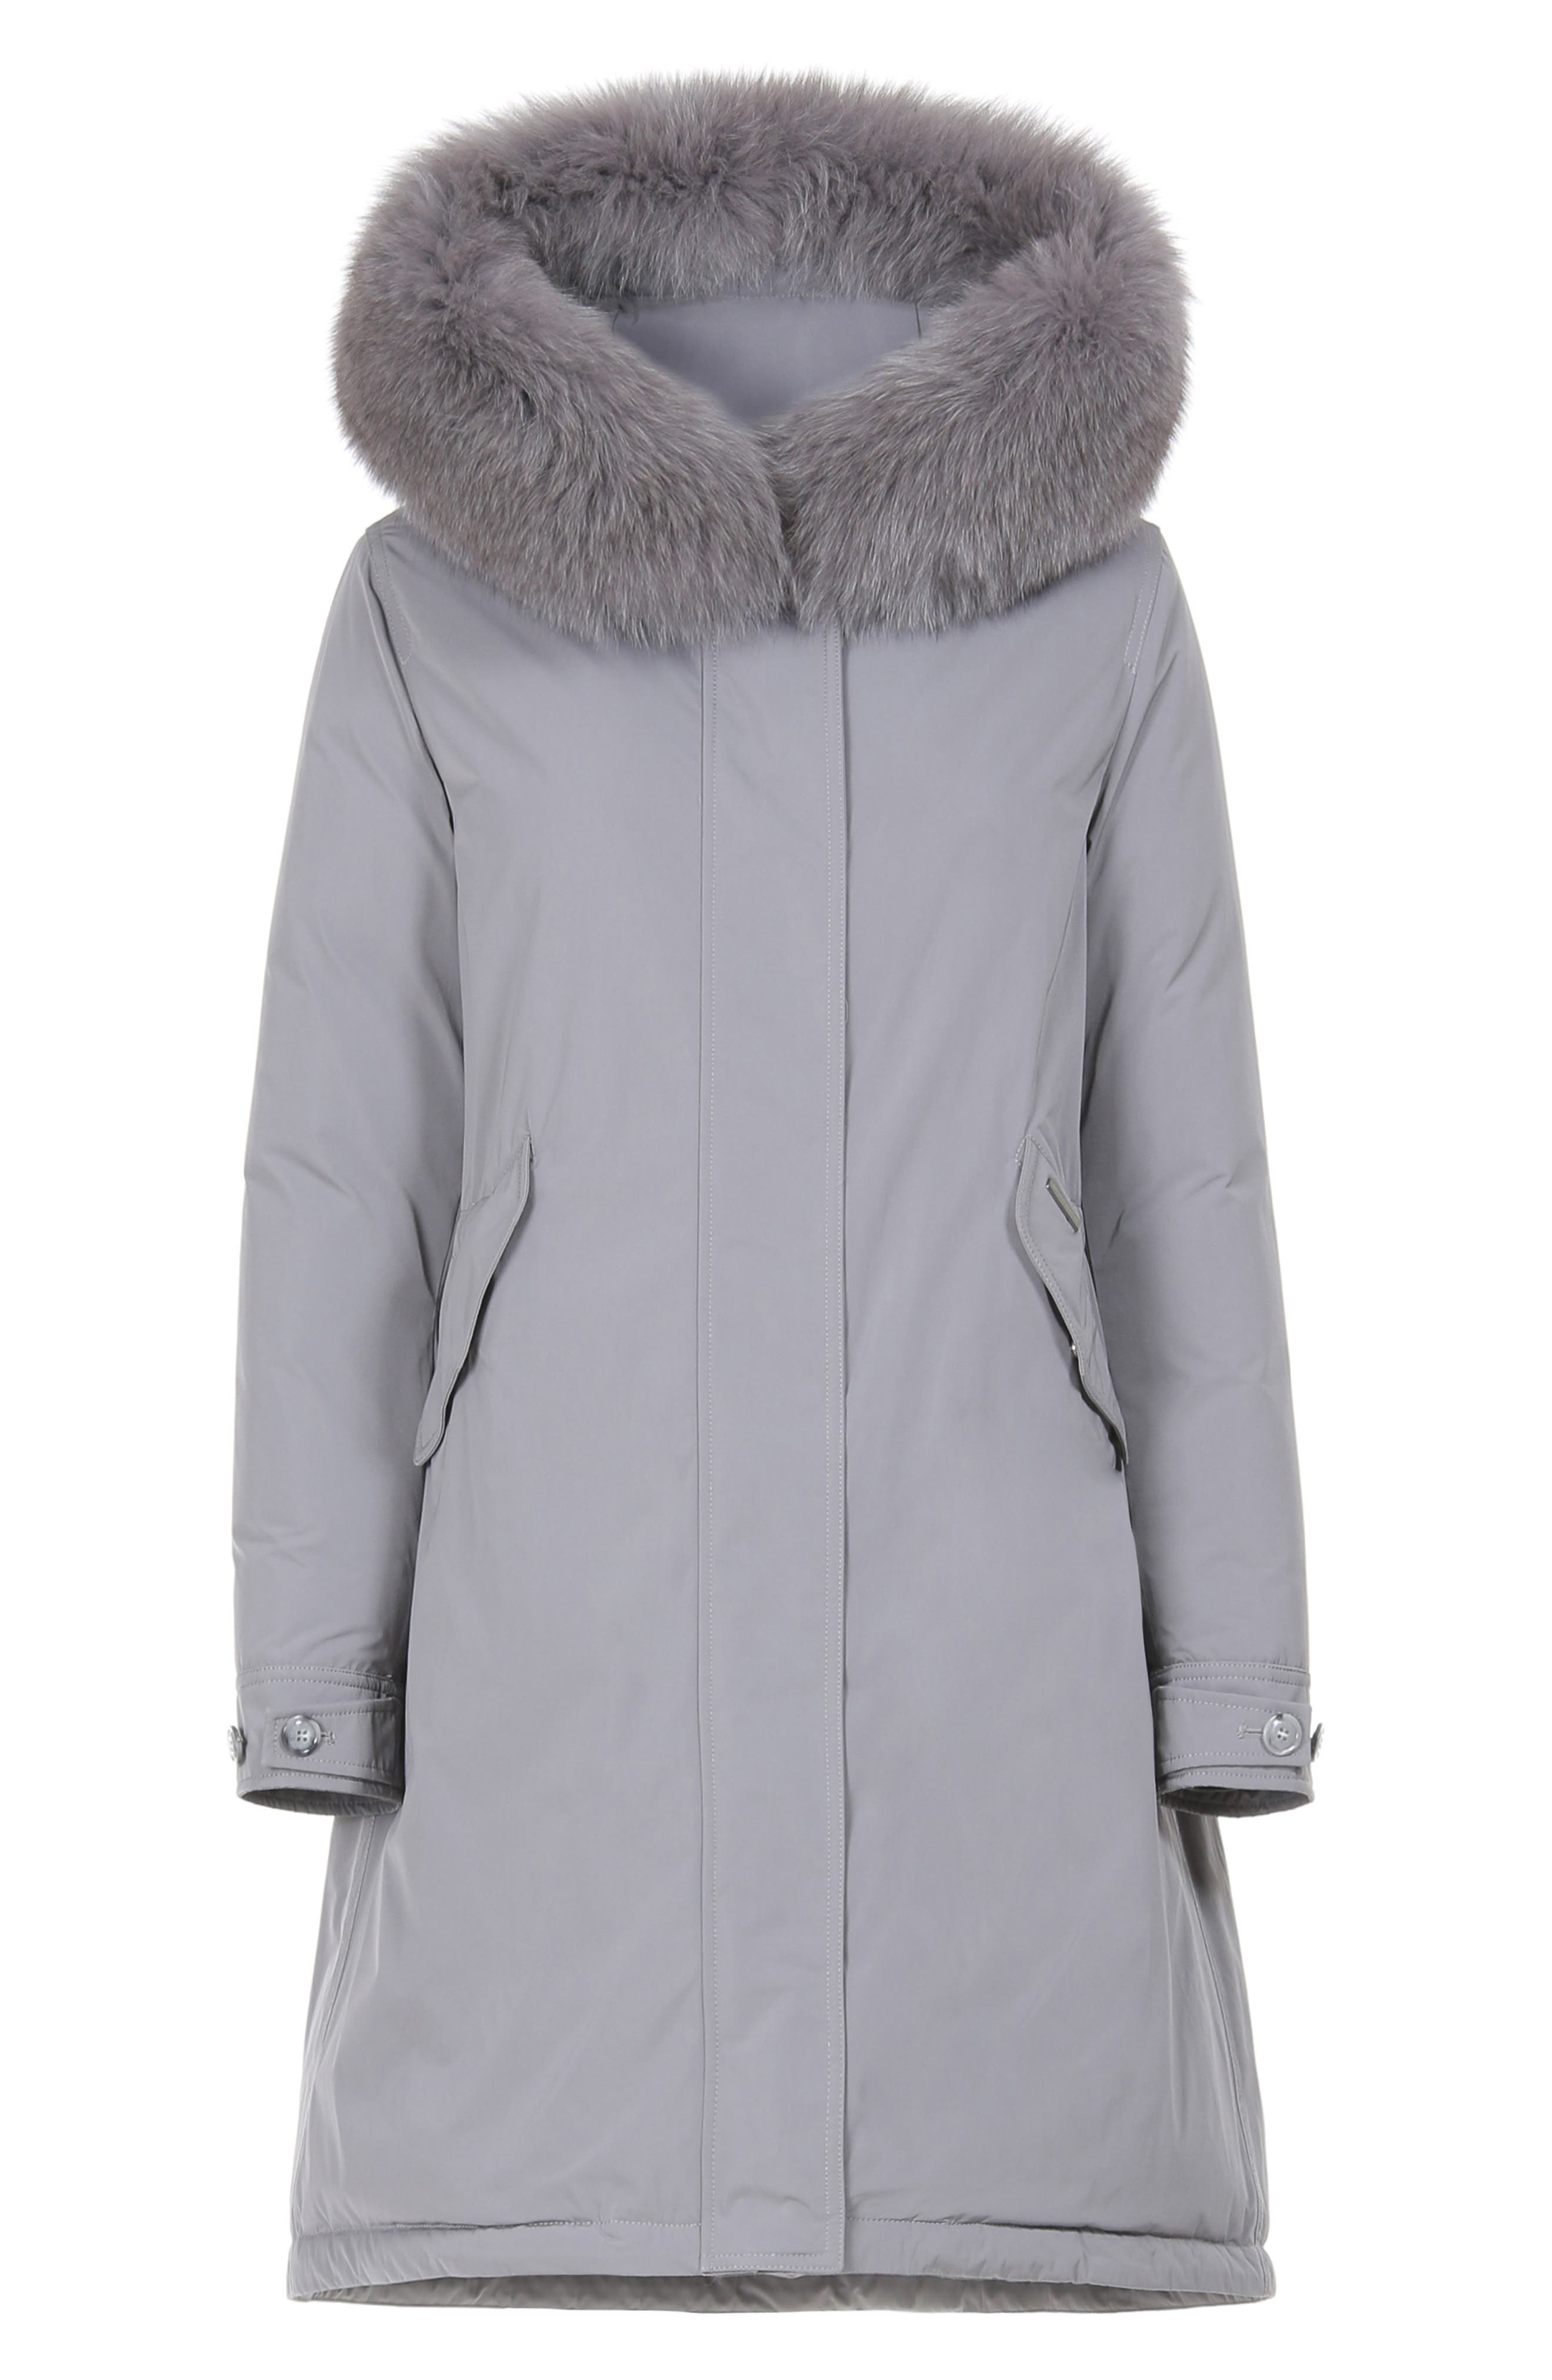 Keystone Down Parka with Genuine Fox Fur Trim,                             Alternate thumbnail 4, color,                             URBAN GREY